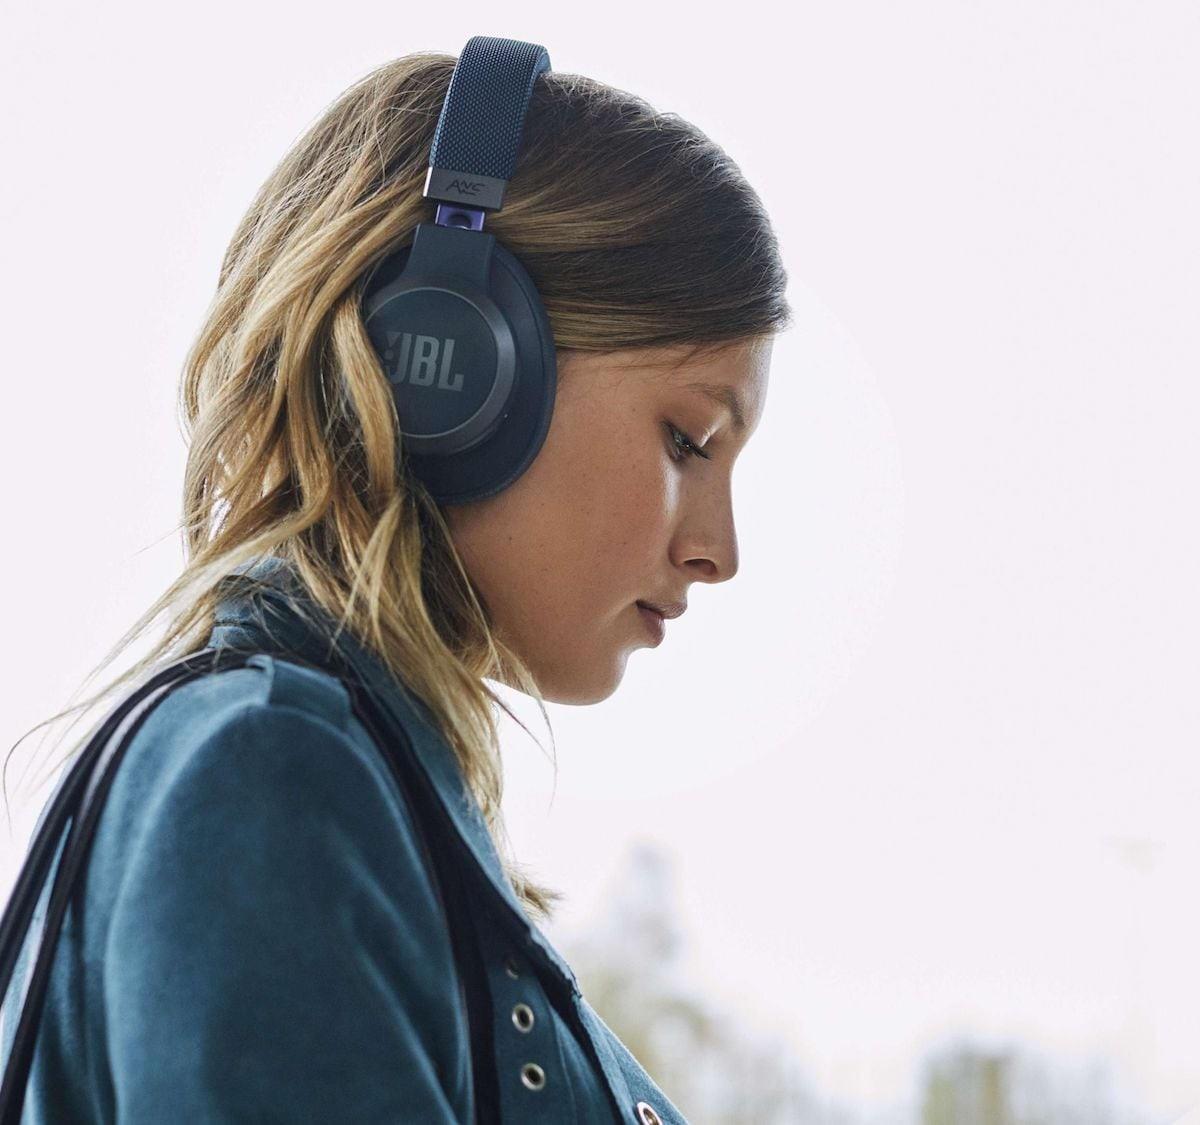 JBL LIVE 650BTNC wireless hands-free headphones respond to Amazon Alexa voice commands